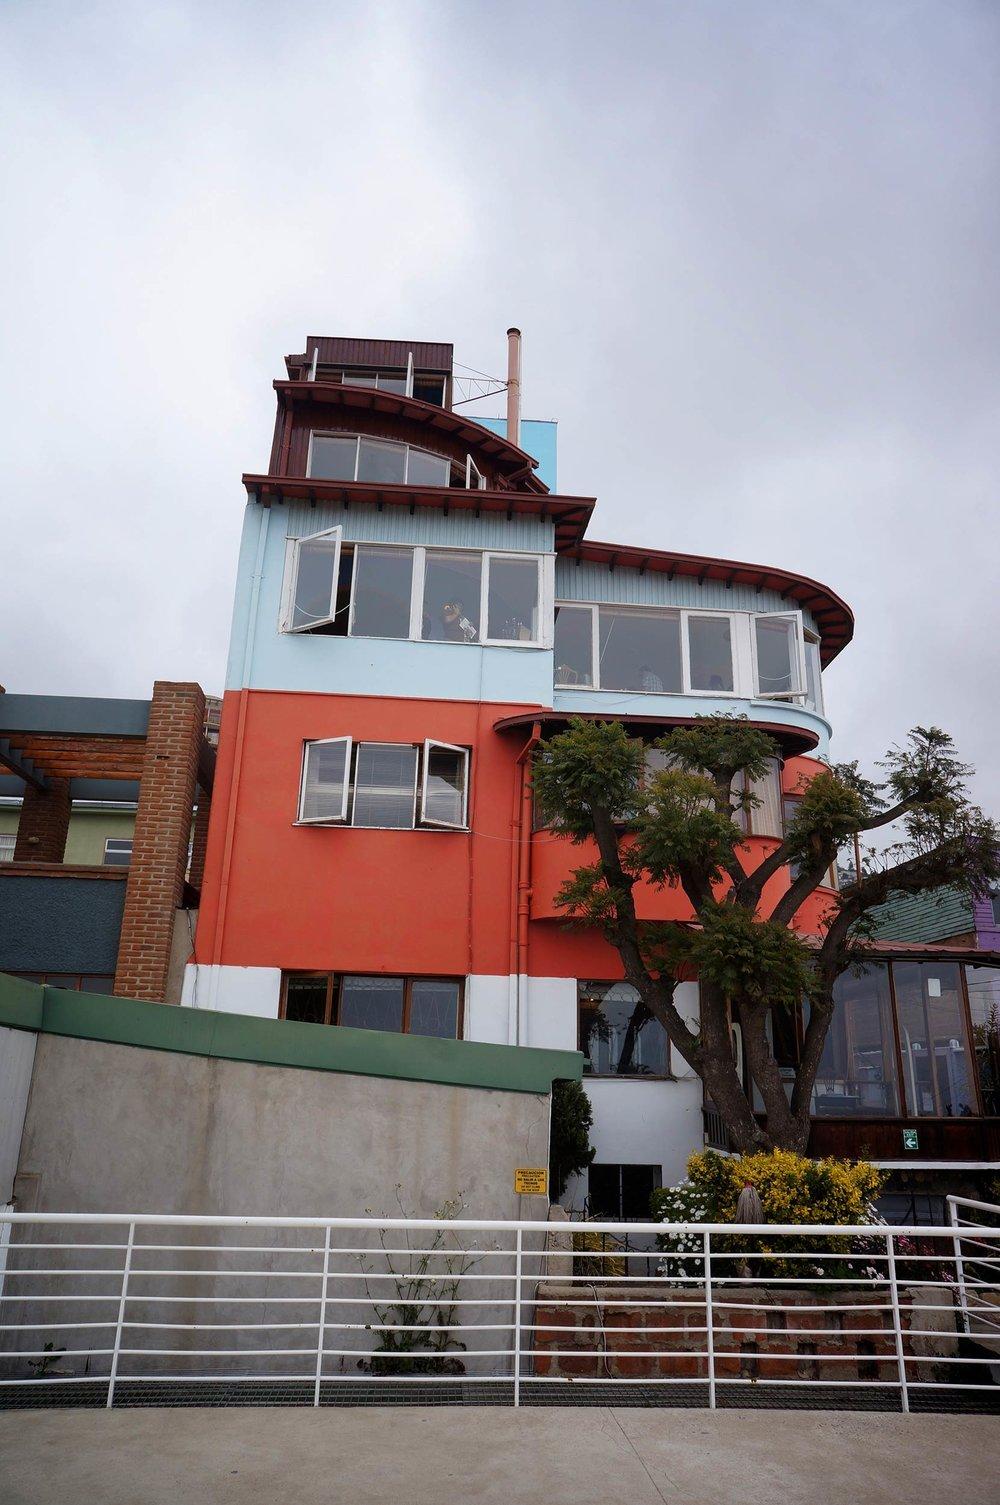 valparaiso_chile_pablo_neruda_house_la_sebastiana.jpg